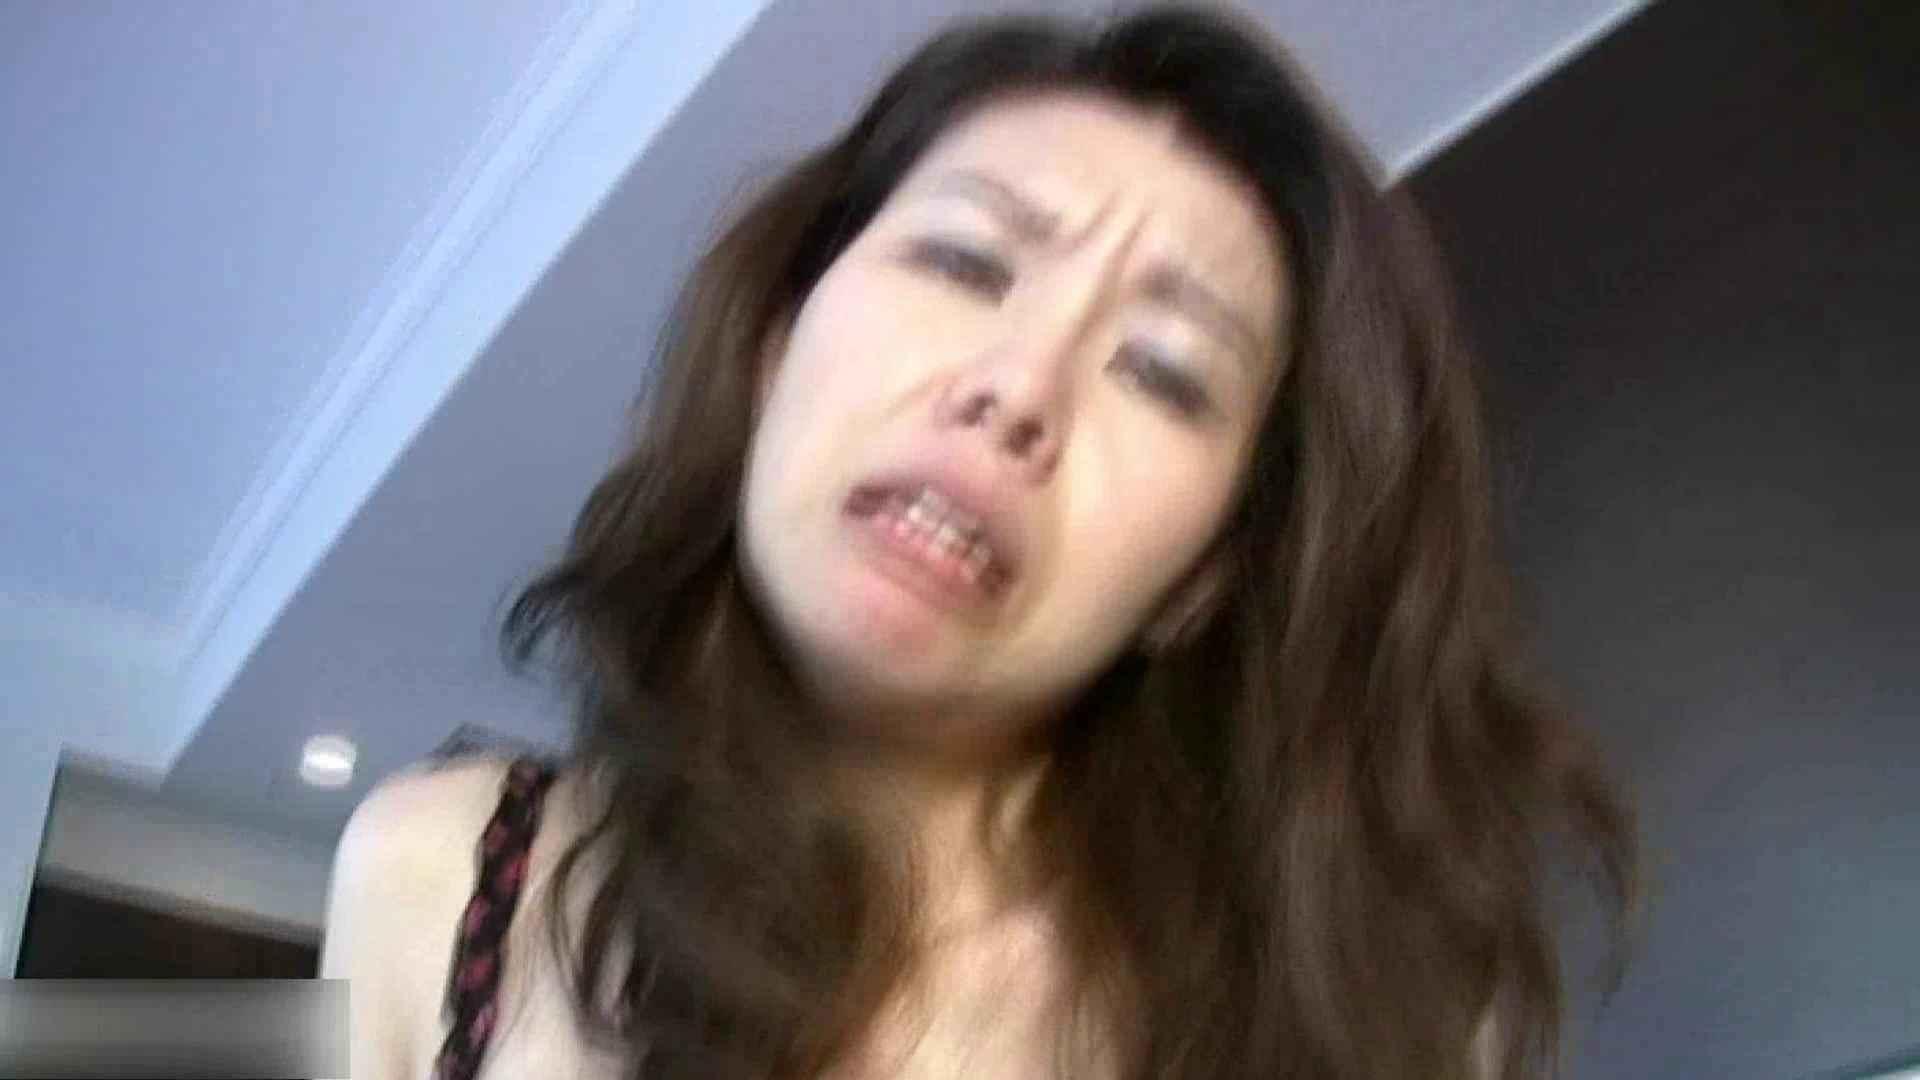 人妻3P物語 Vol.06 美女OL | 人妻  58連発 13